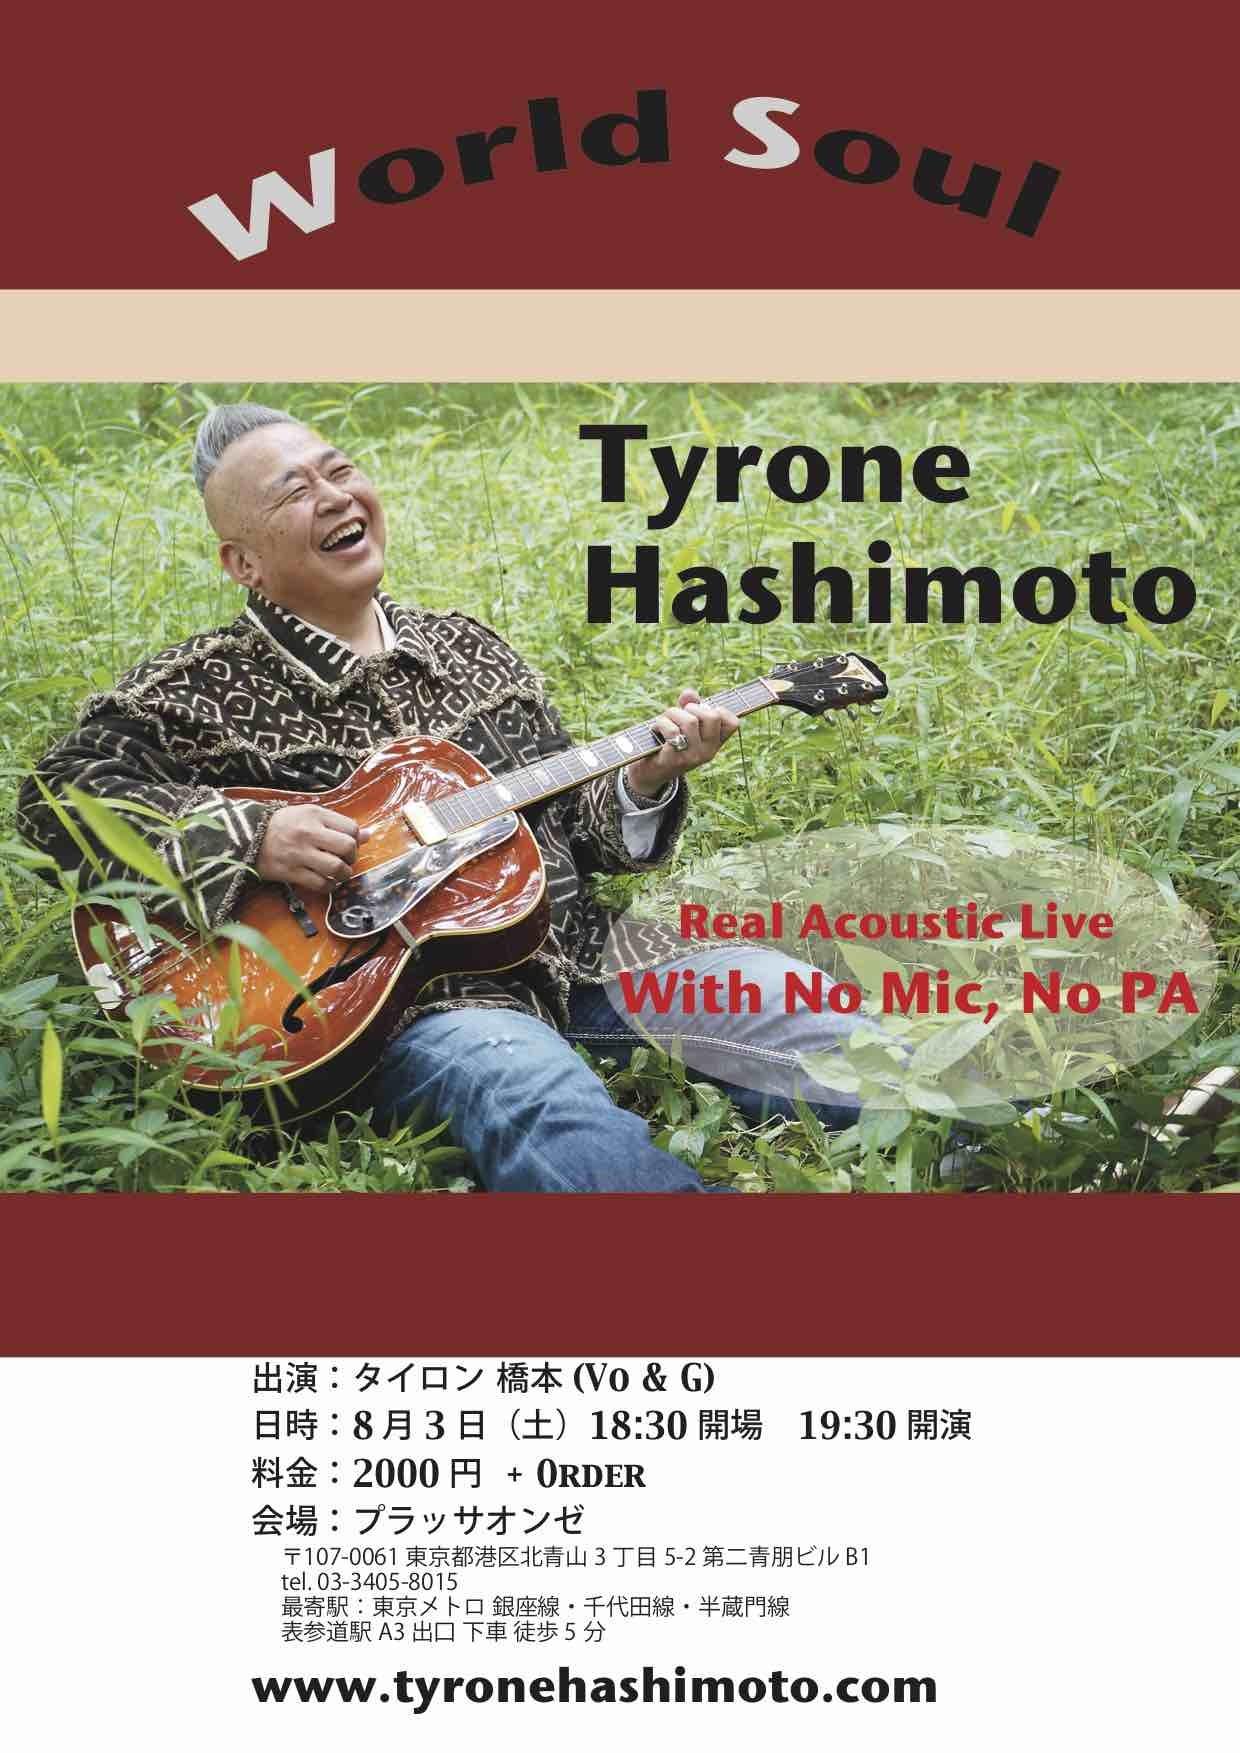 Tyrone Hashimoto 8月 ライブ情報_c0368808_22412227.jpg